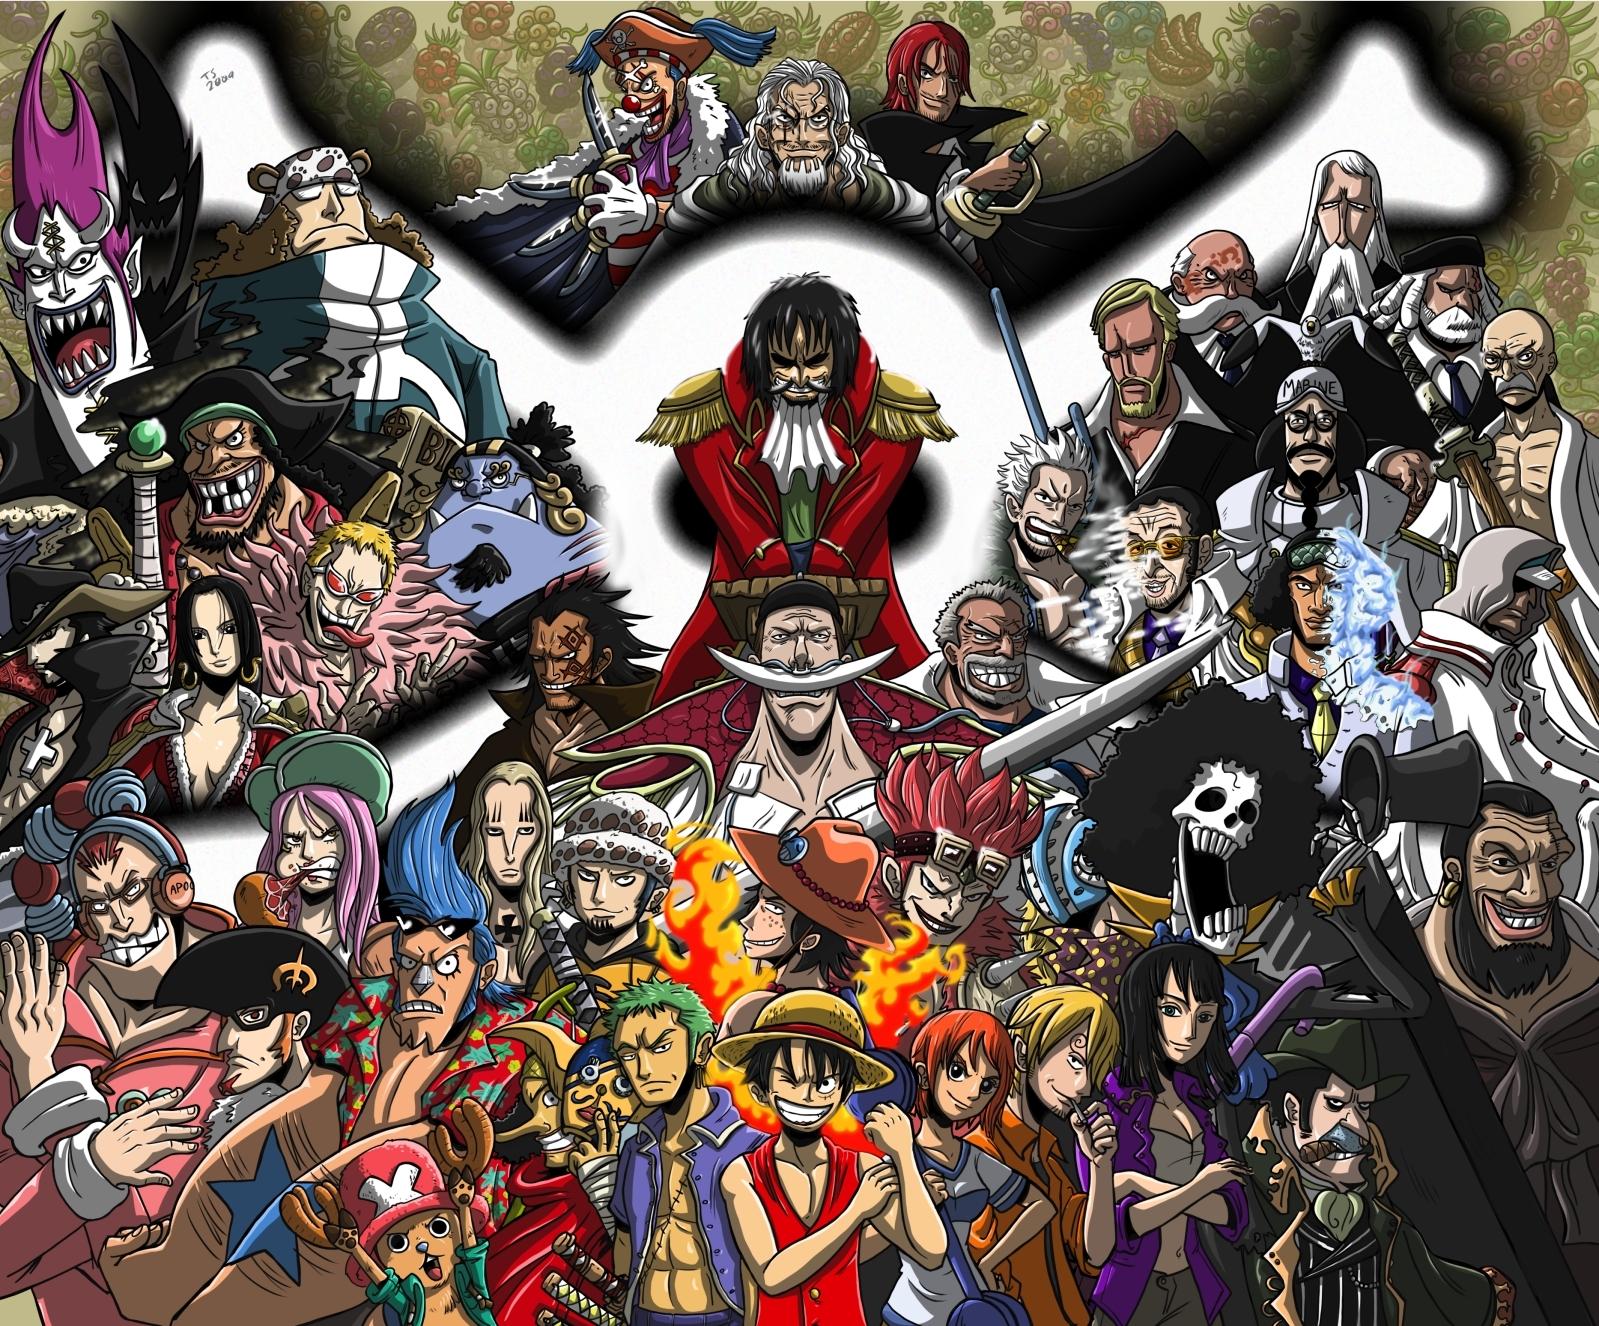 1 Piece Anime Characters : ภาพการ์ตูน one piece anime wallpaper